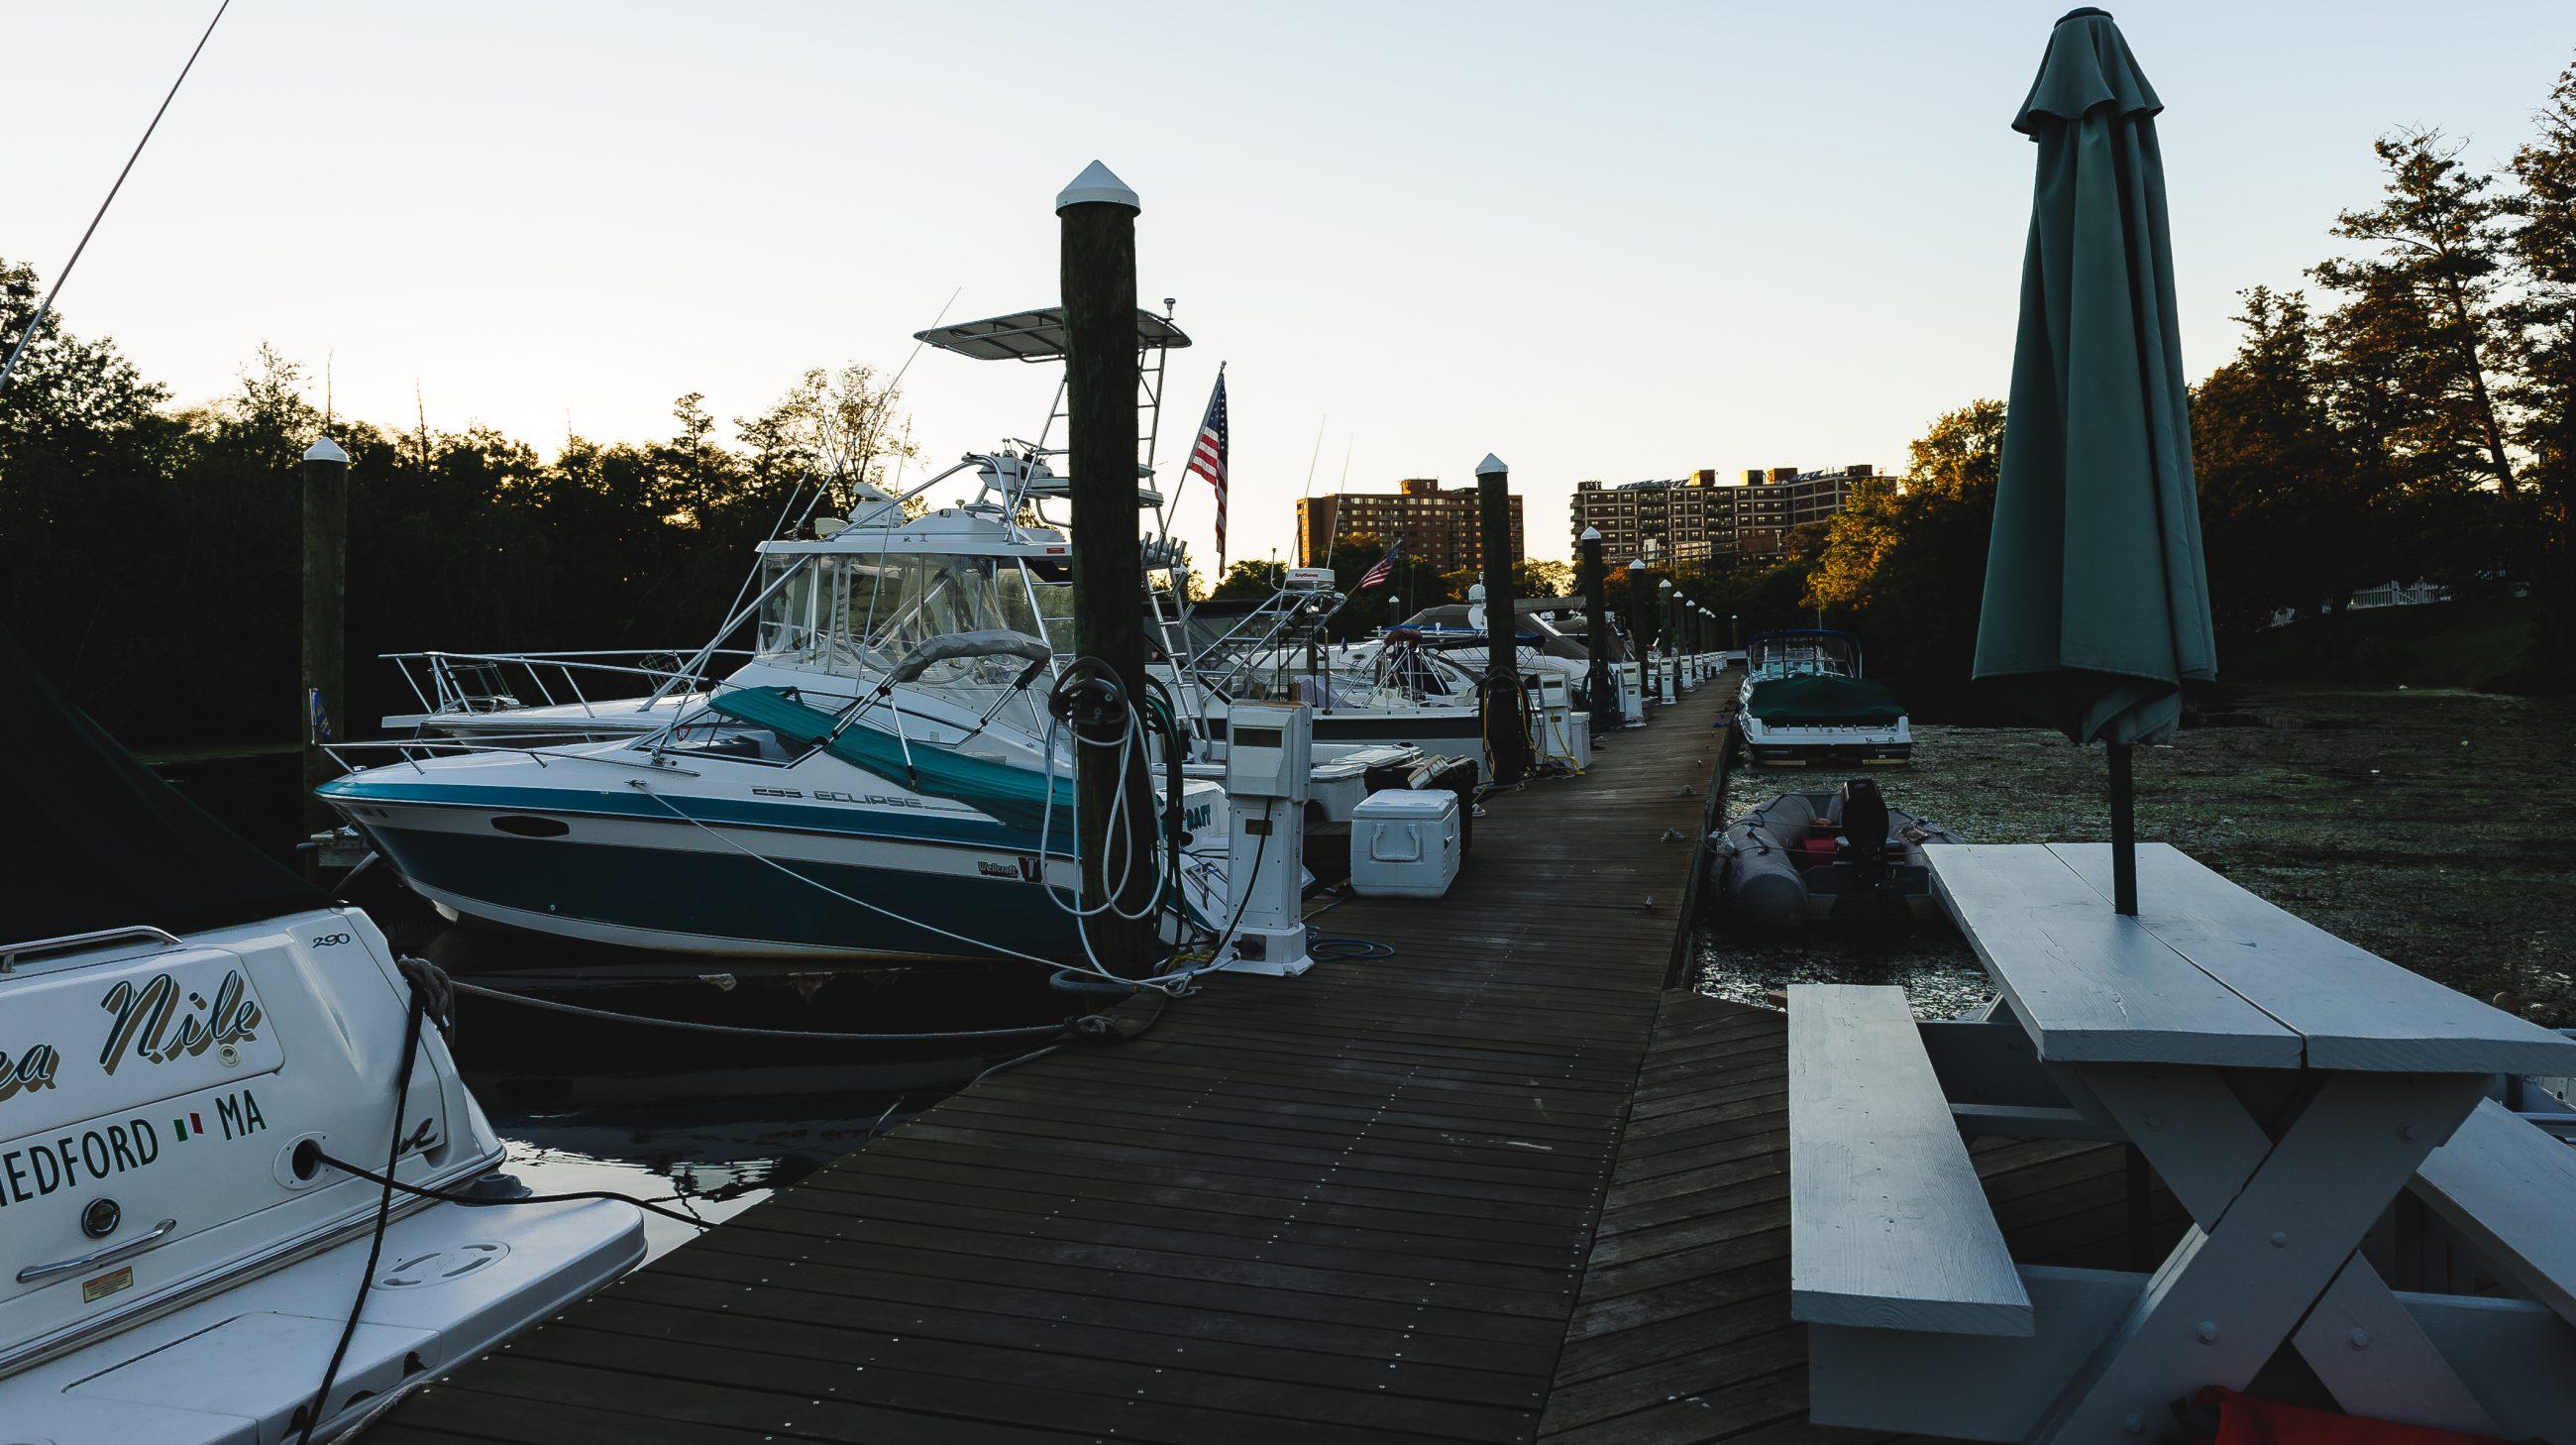 Riverside Yacht Club - Medford's Family Boating Club